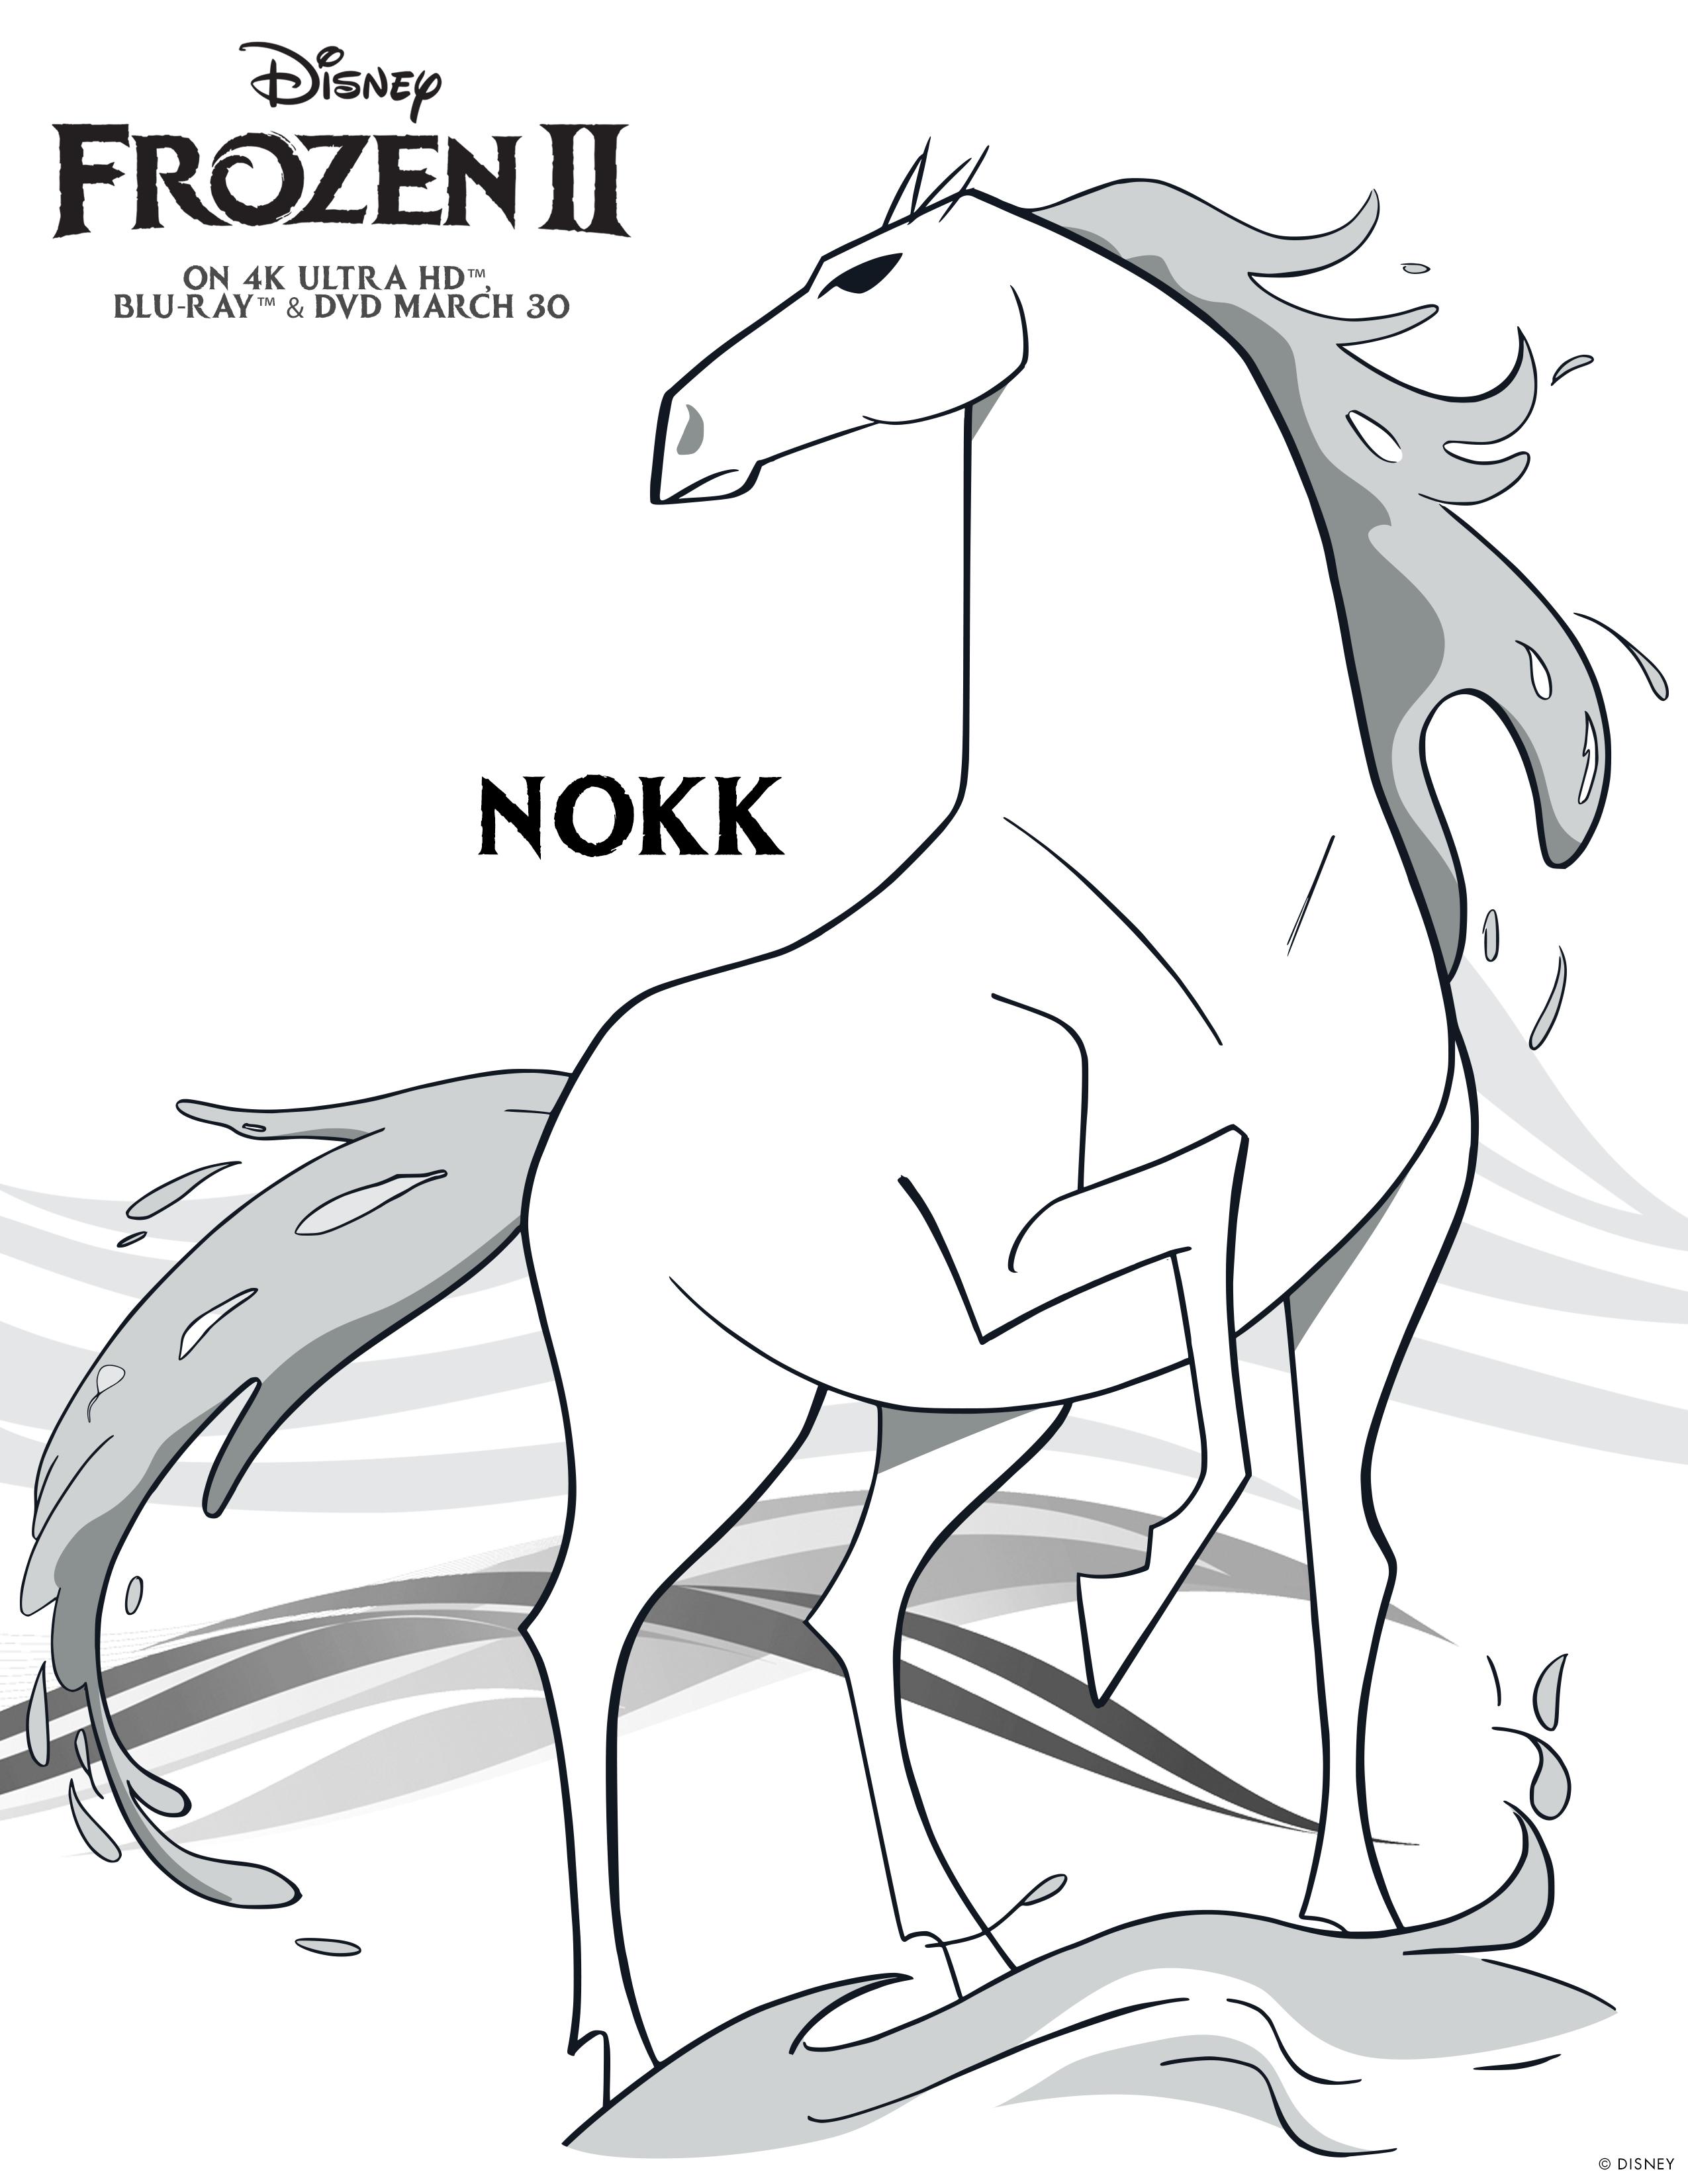 NOKK COLOURING MARCH 30